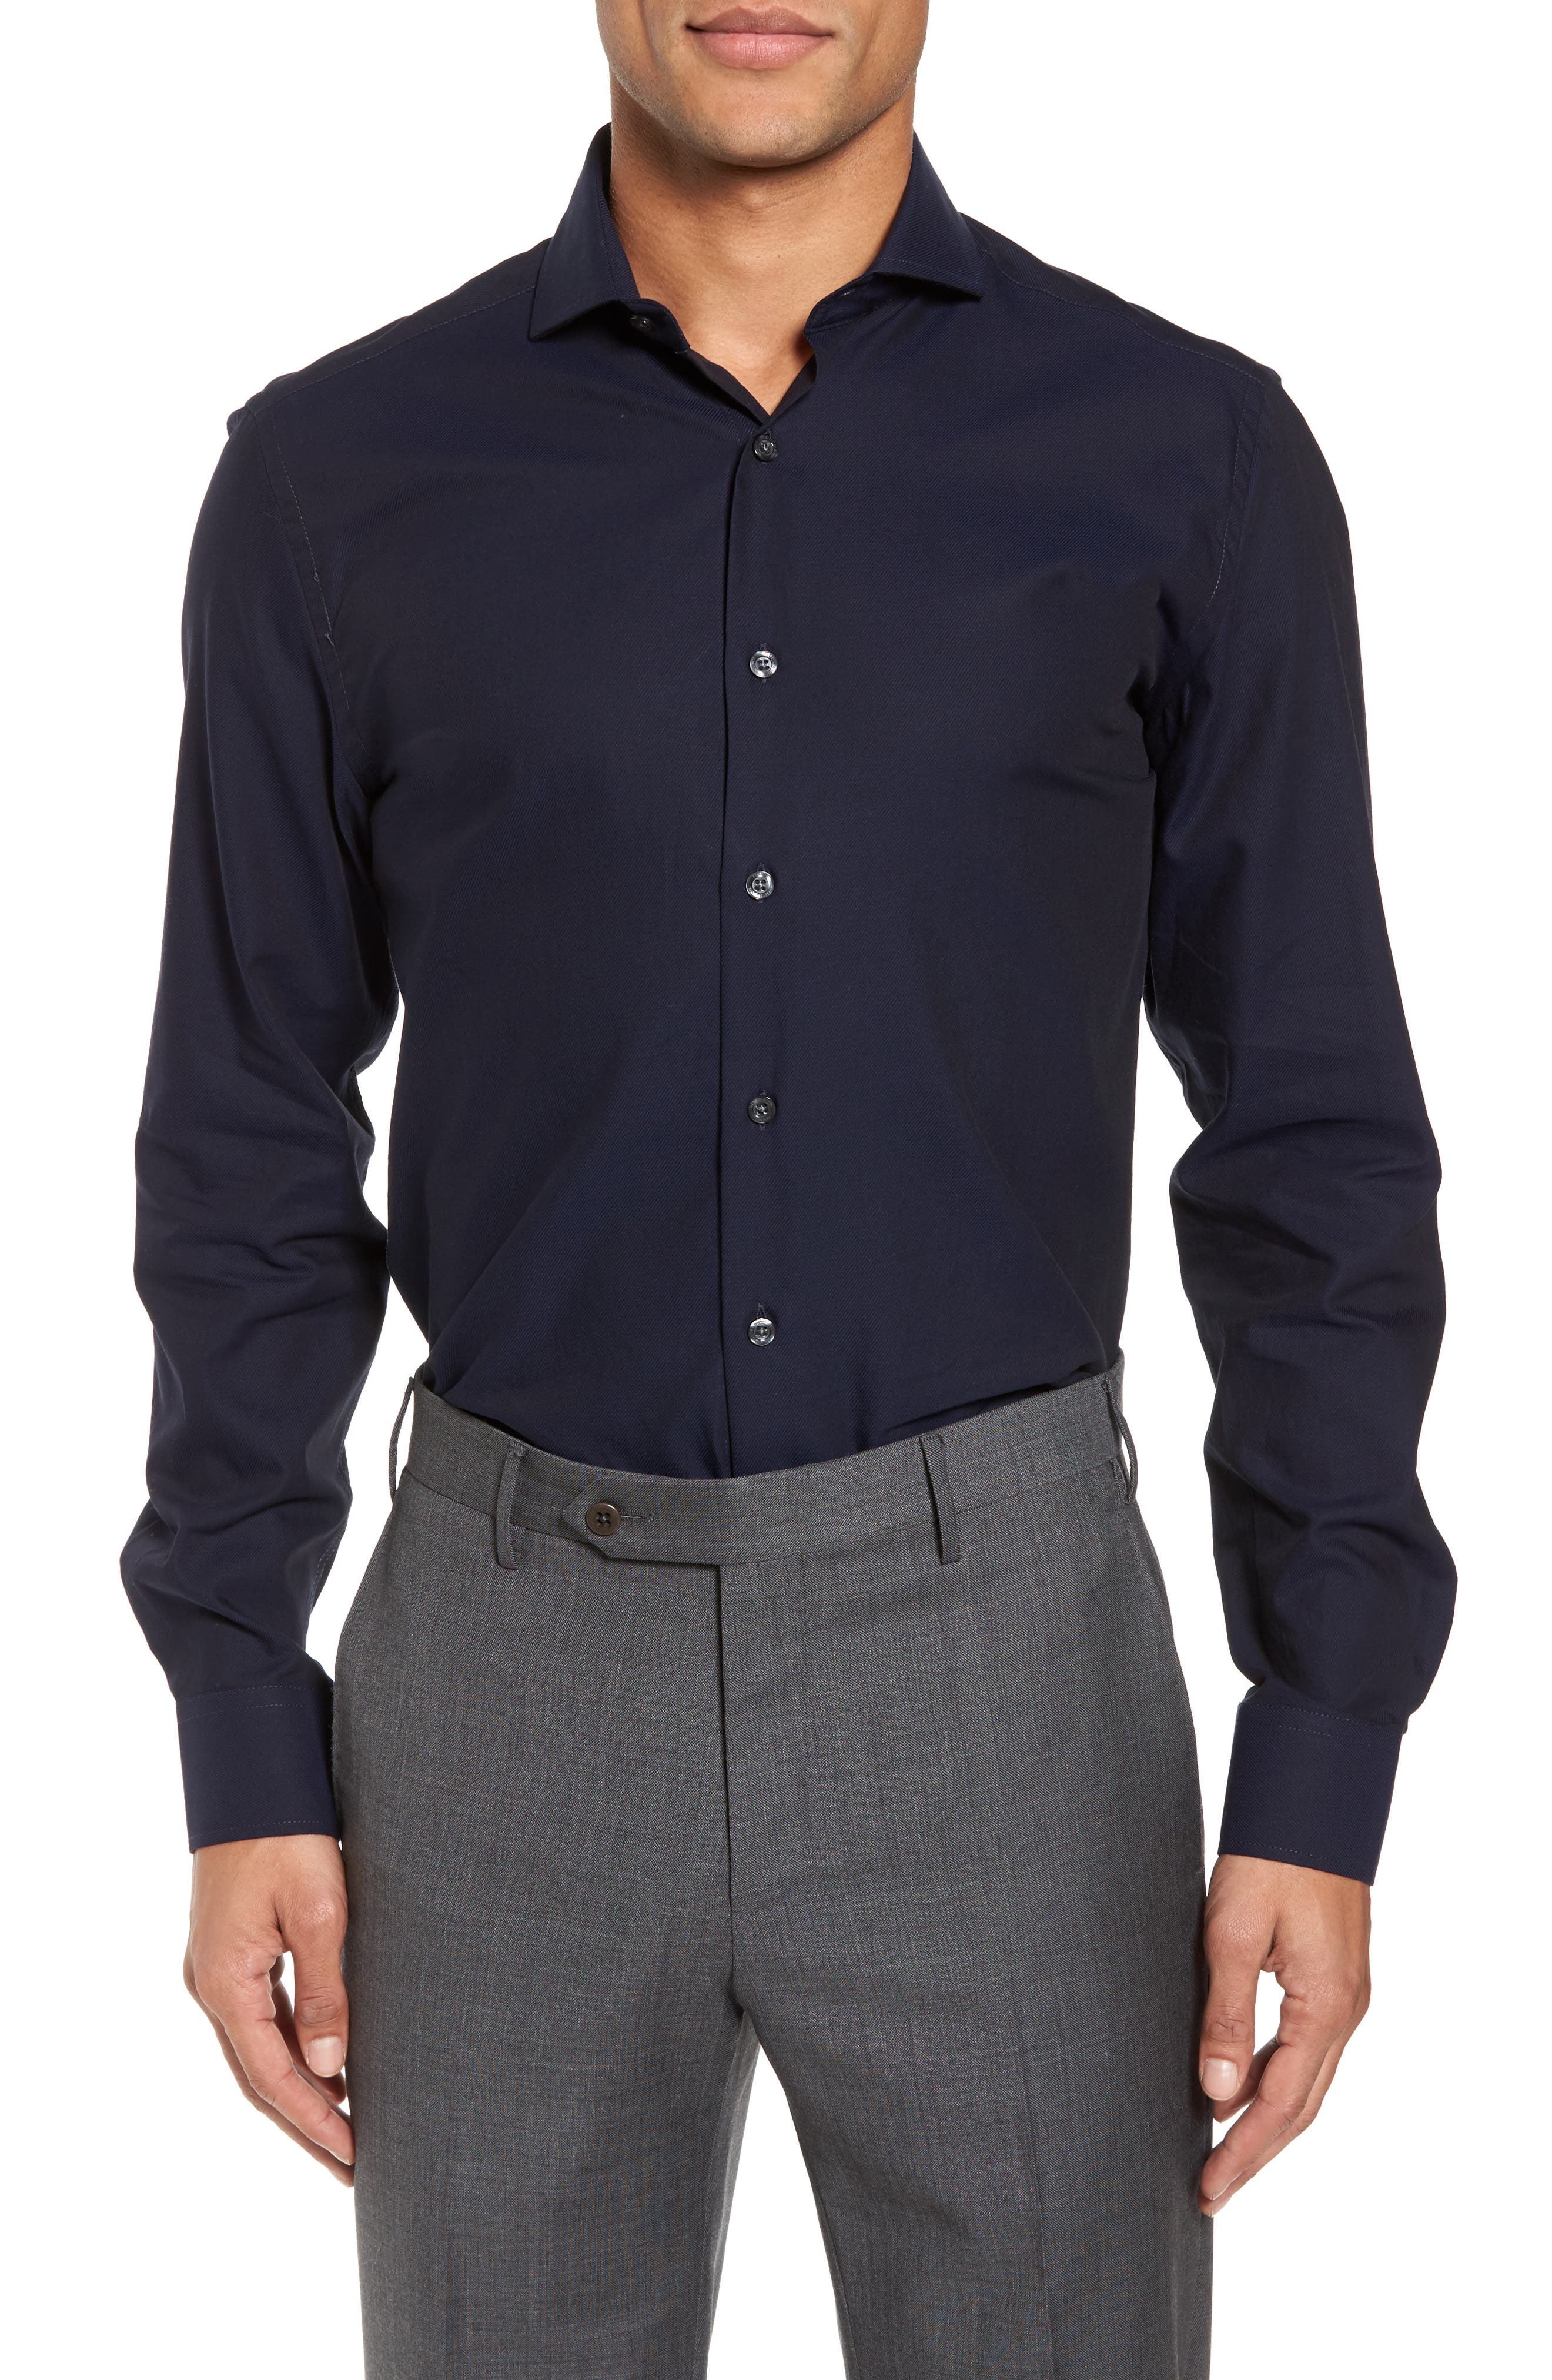 Main Image - Duchamp Trim Fit Solid Dress Shirt